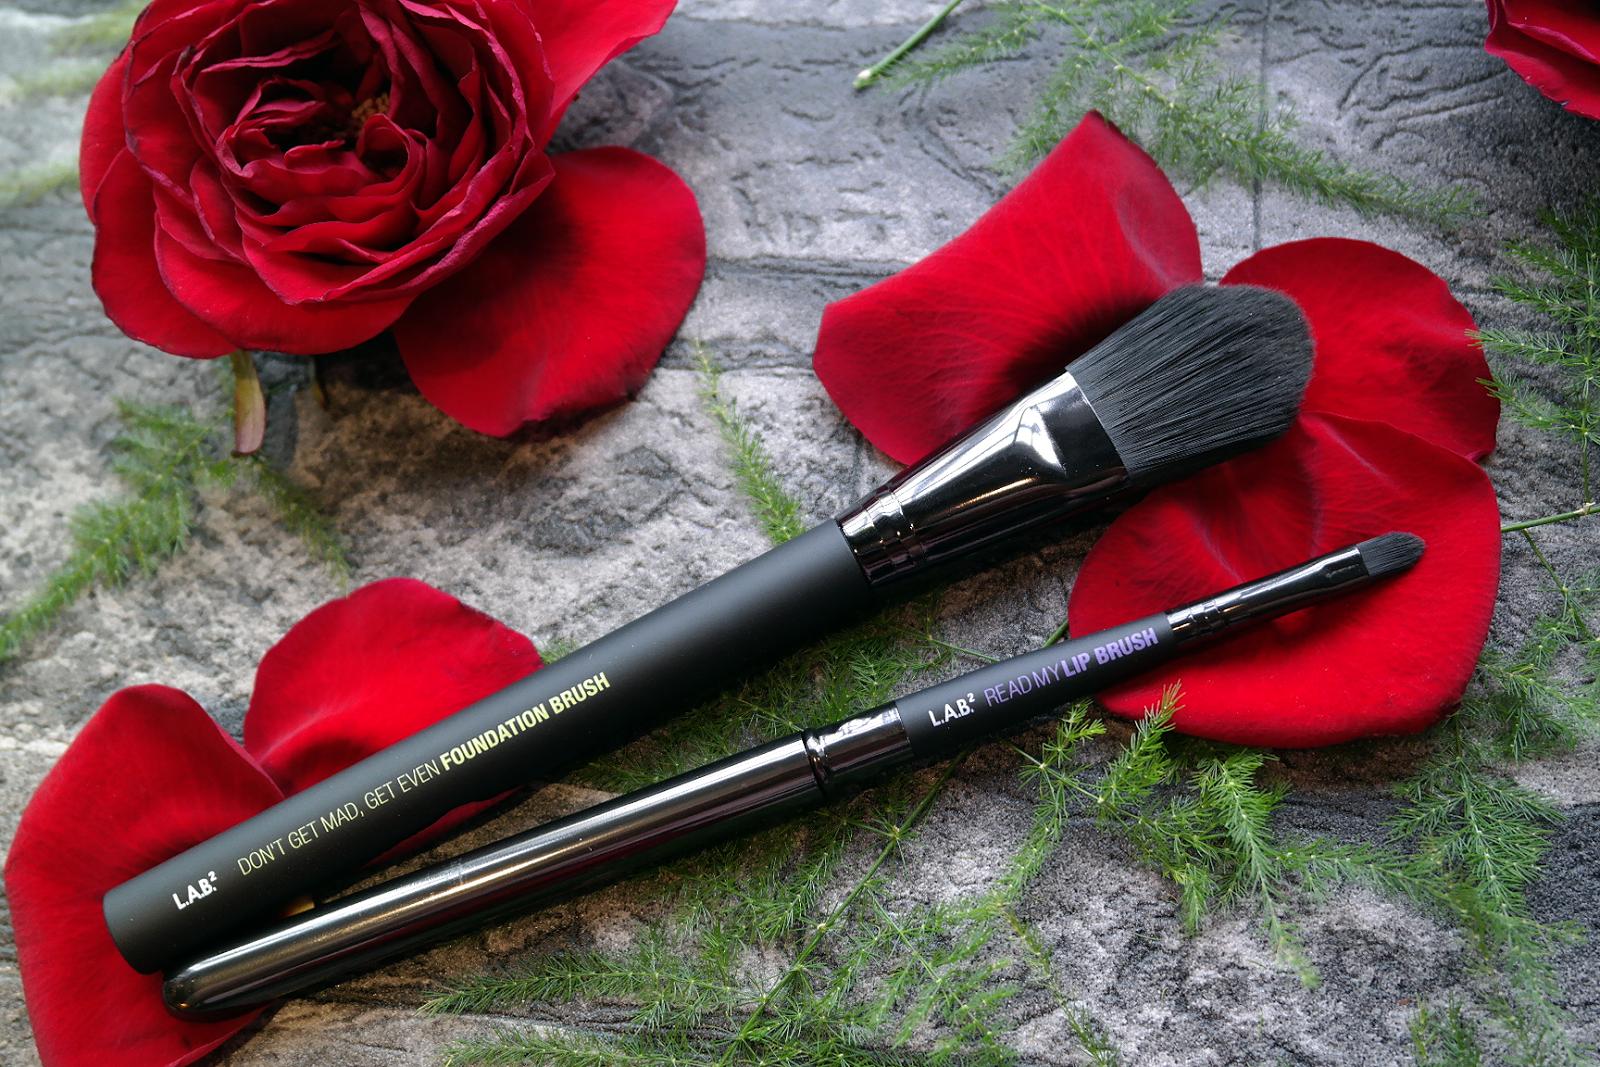 LAB2 Foundation Lip Make Up Brush Review